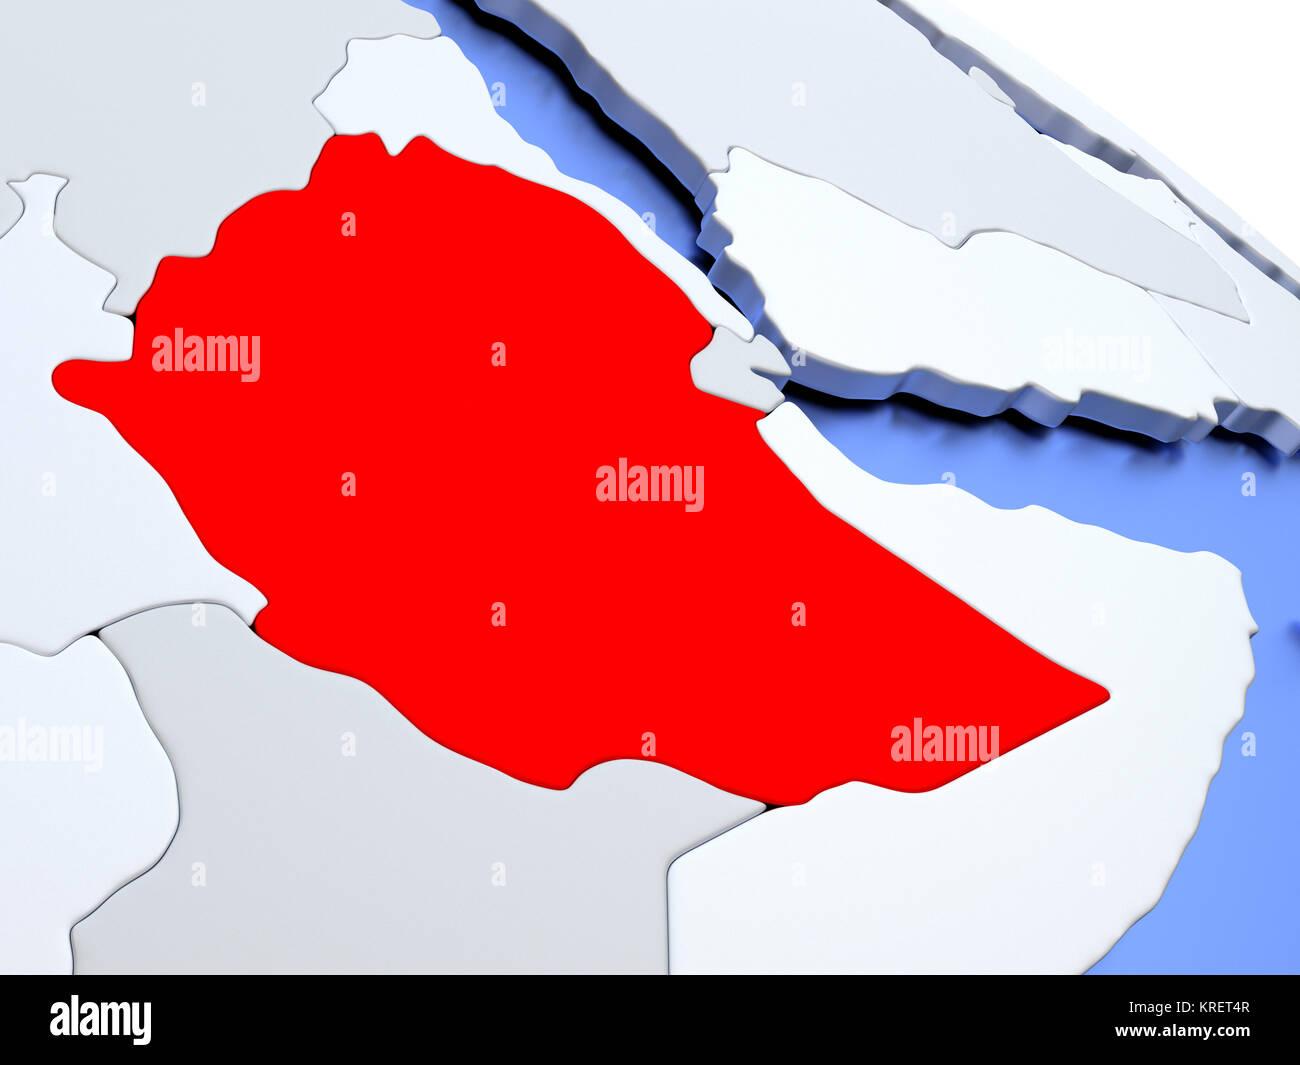 Ethiopia on world map Stock Photo: 169356679 - Alamy